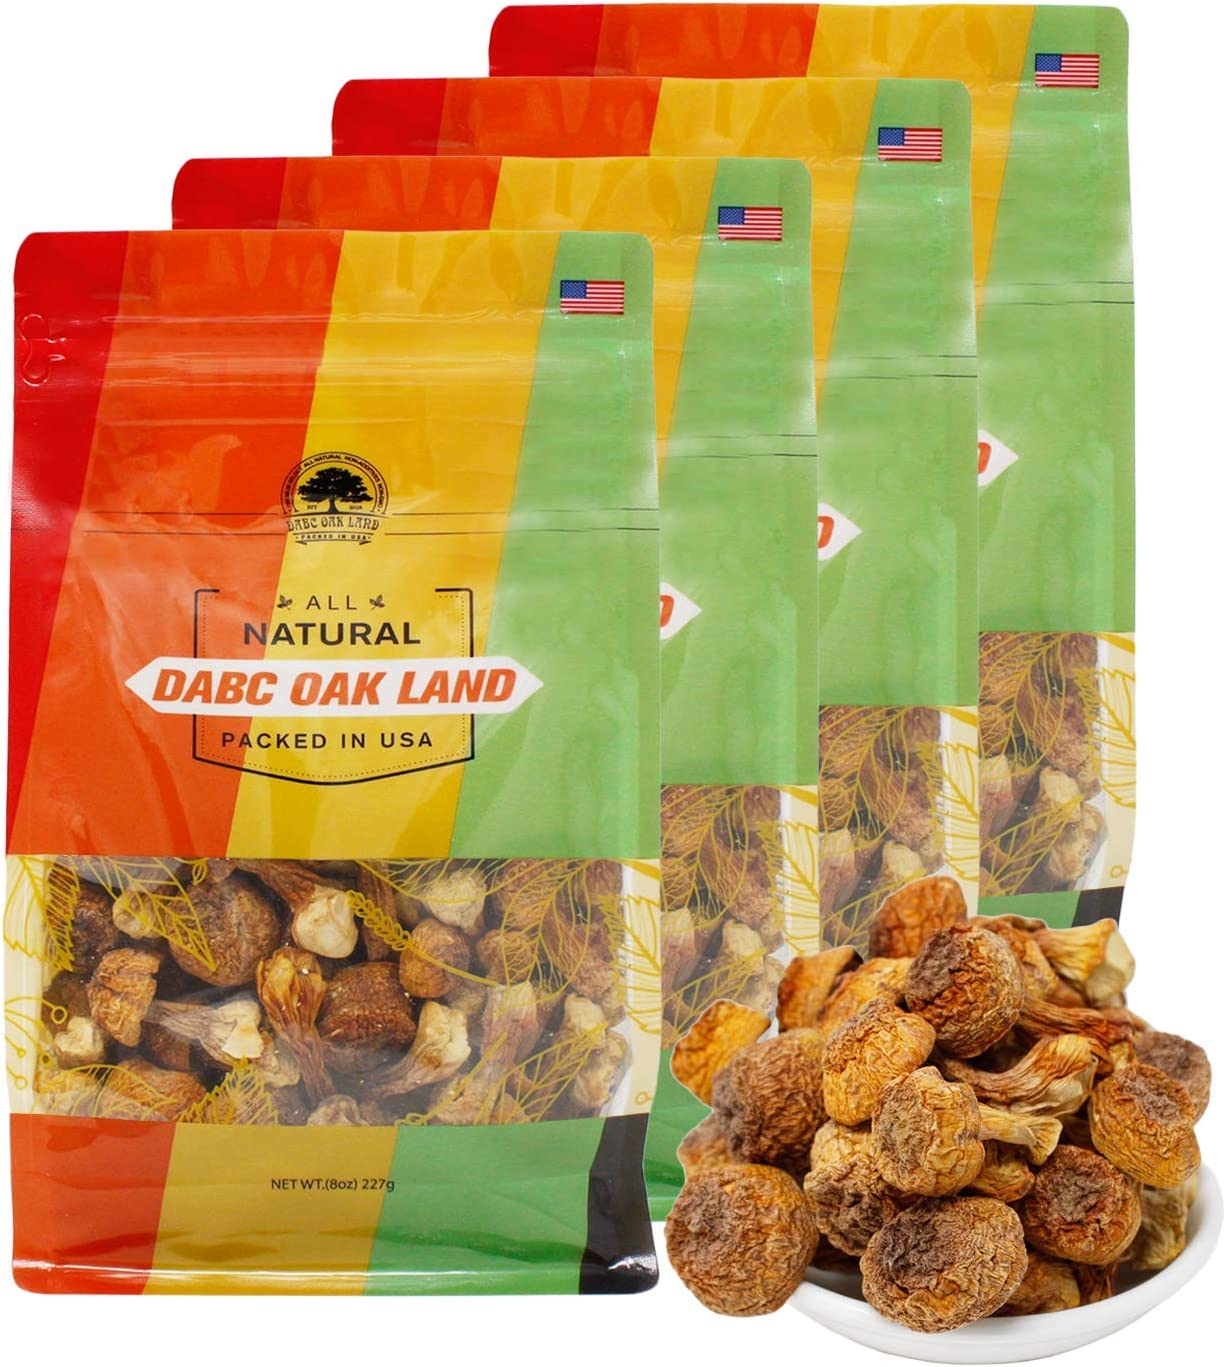 DOL Natural Wild Dried Almond Mushroom Agaricus Blazei 姬松茸 Food additives Free - in Bag (2 Pound)